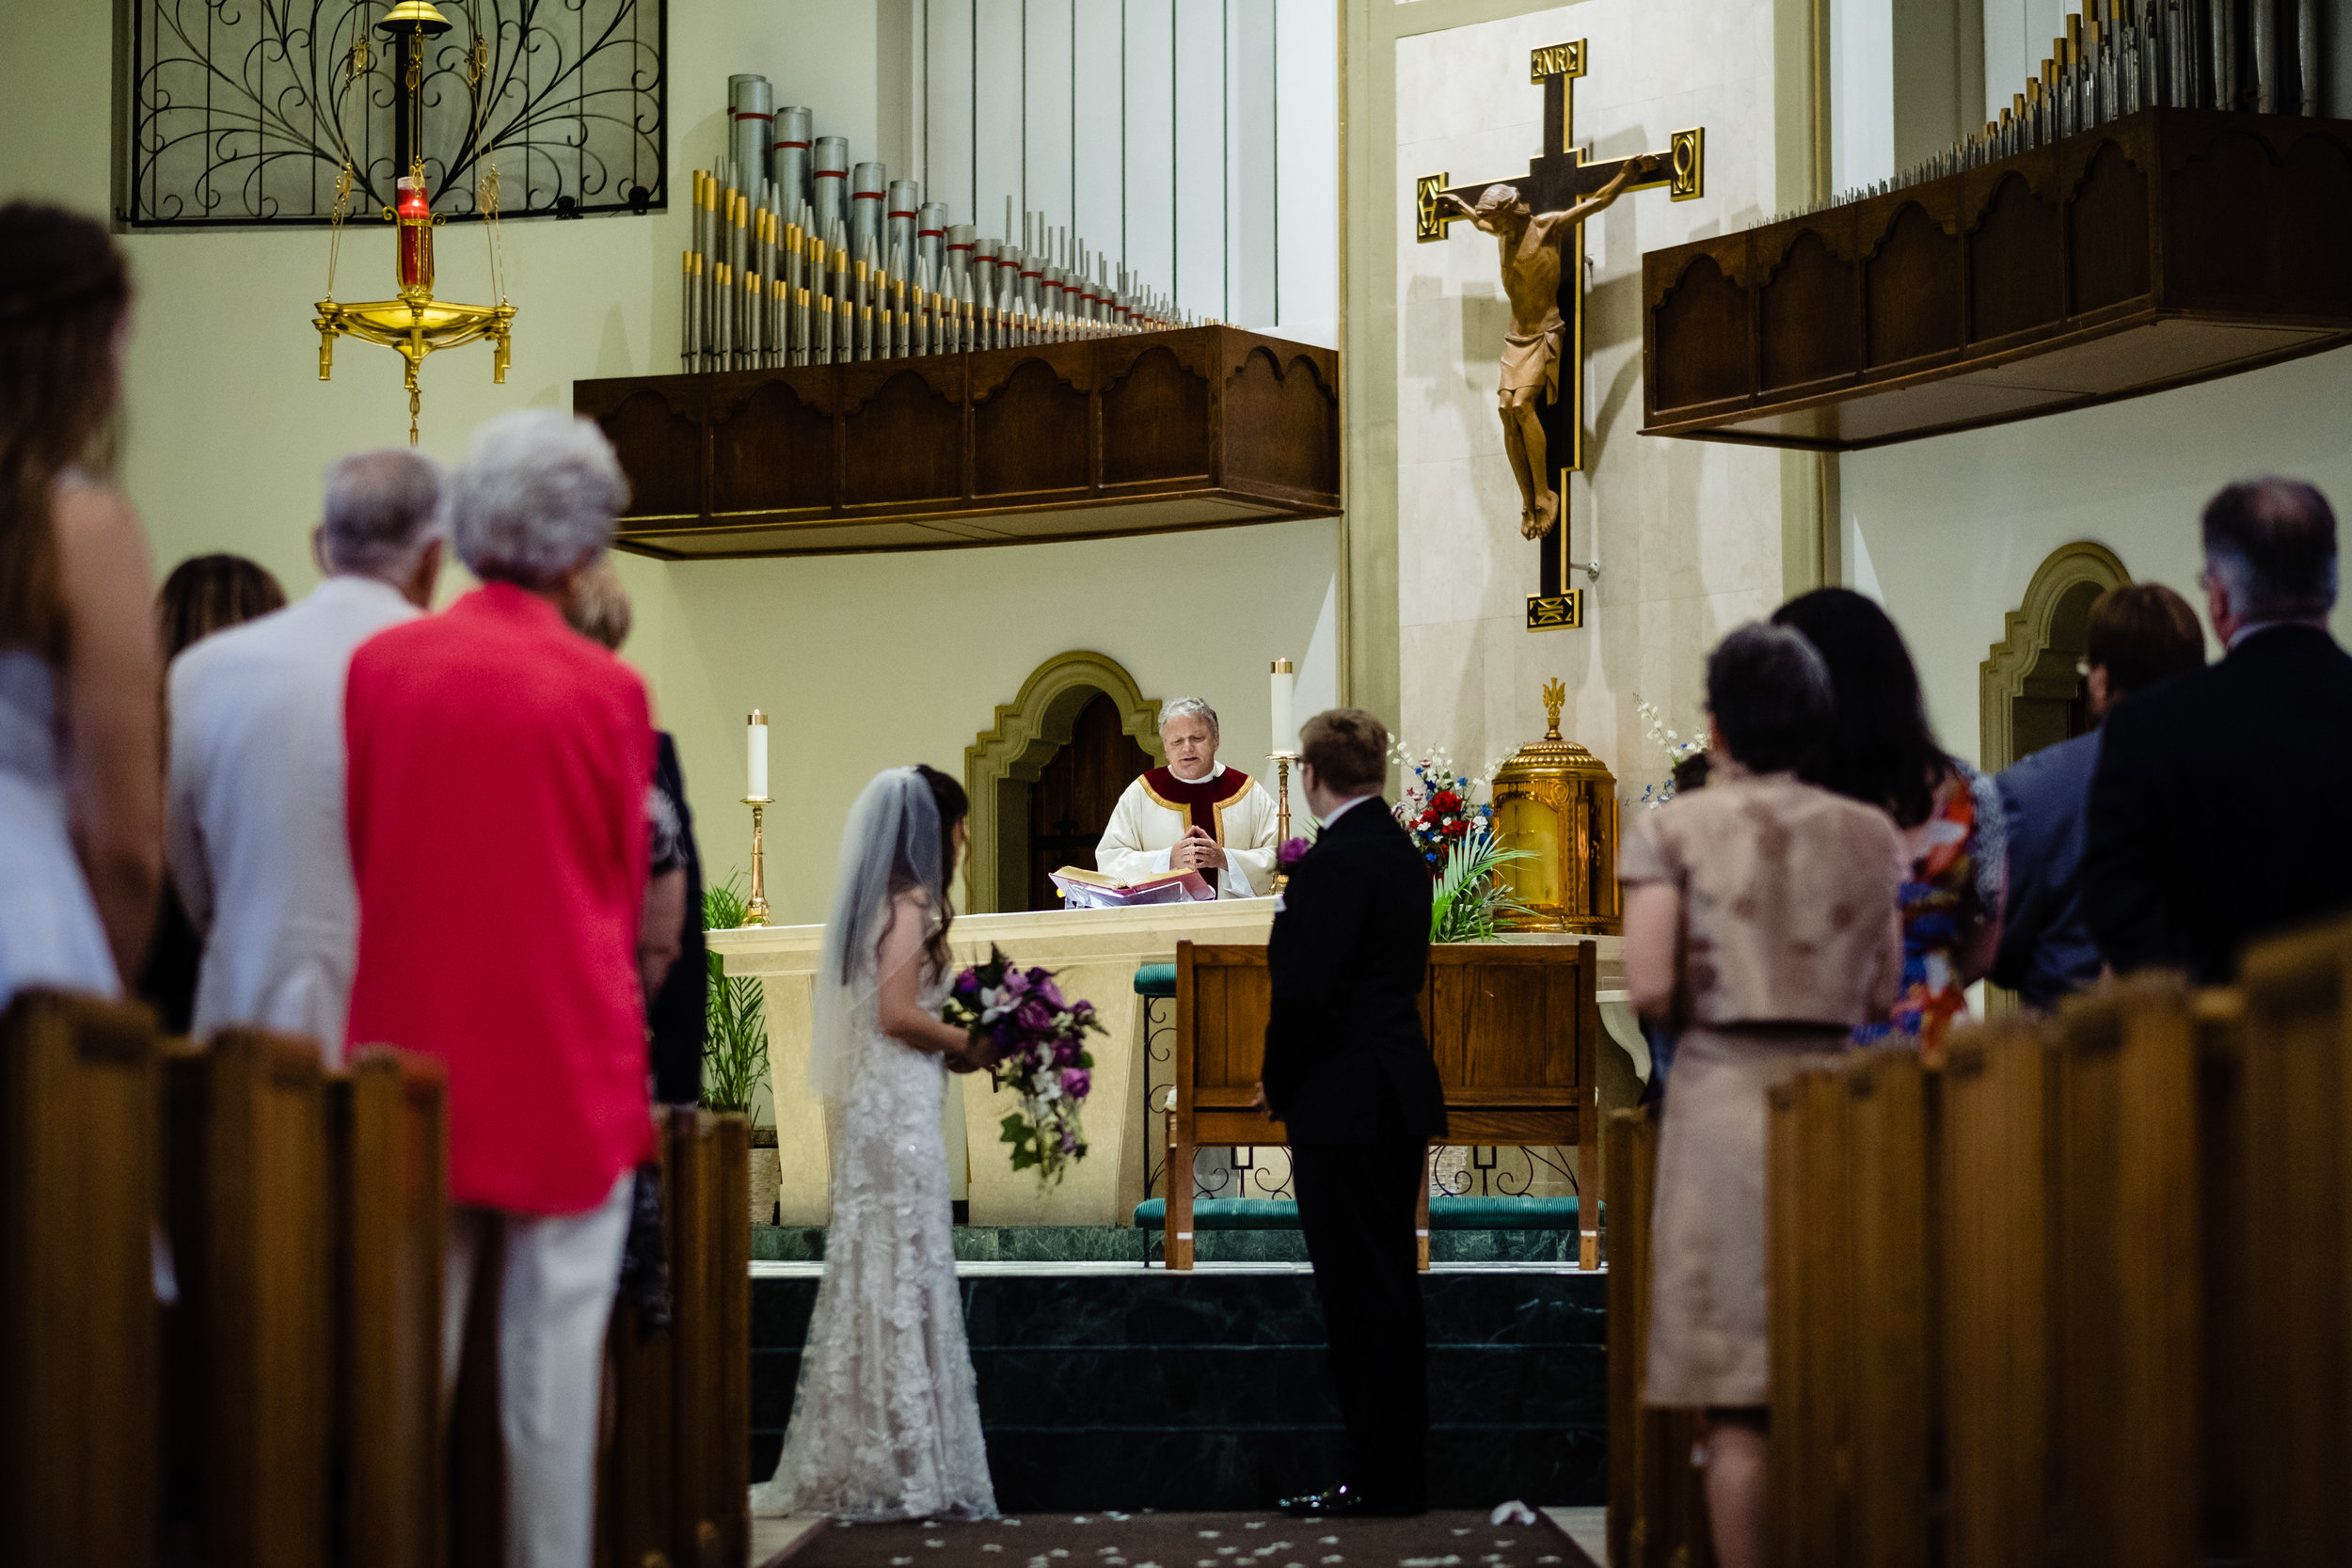 HAH_Zoe and Daniel_Clearwater Wedding_59_2018.jpg